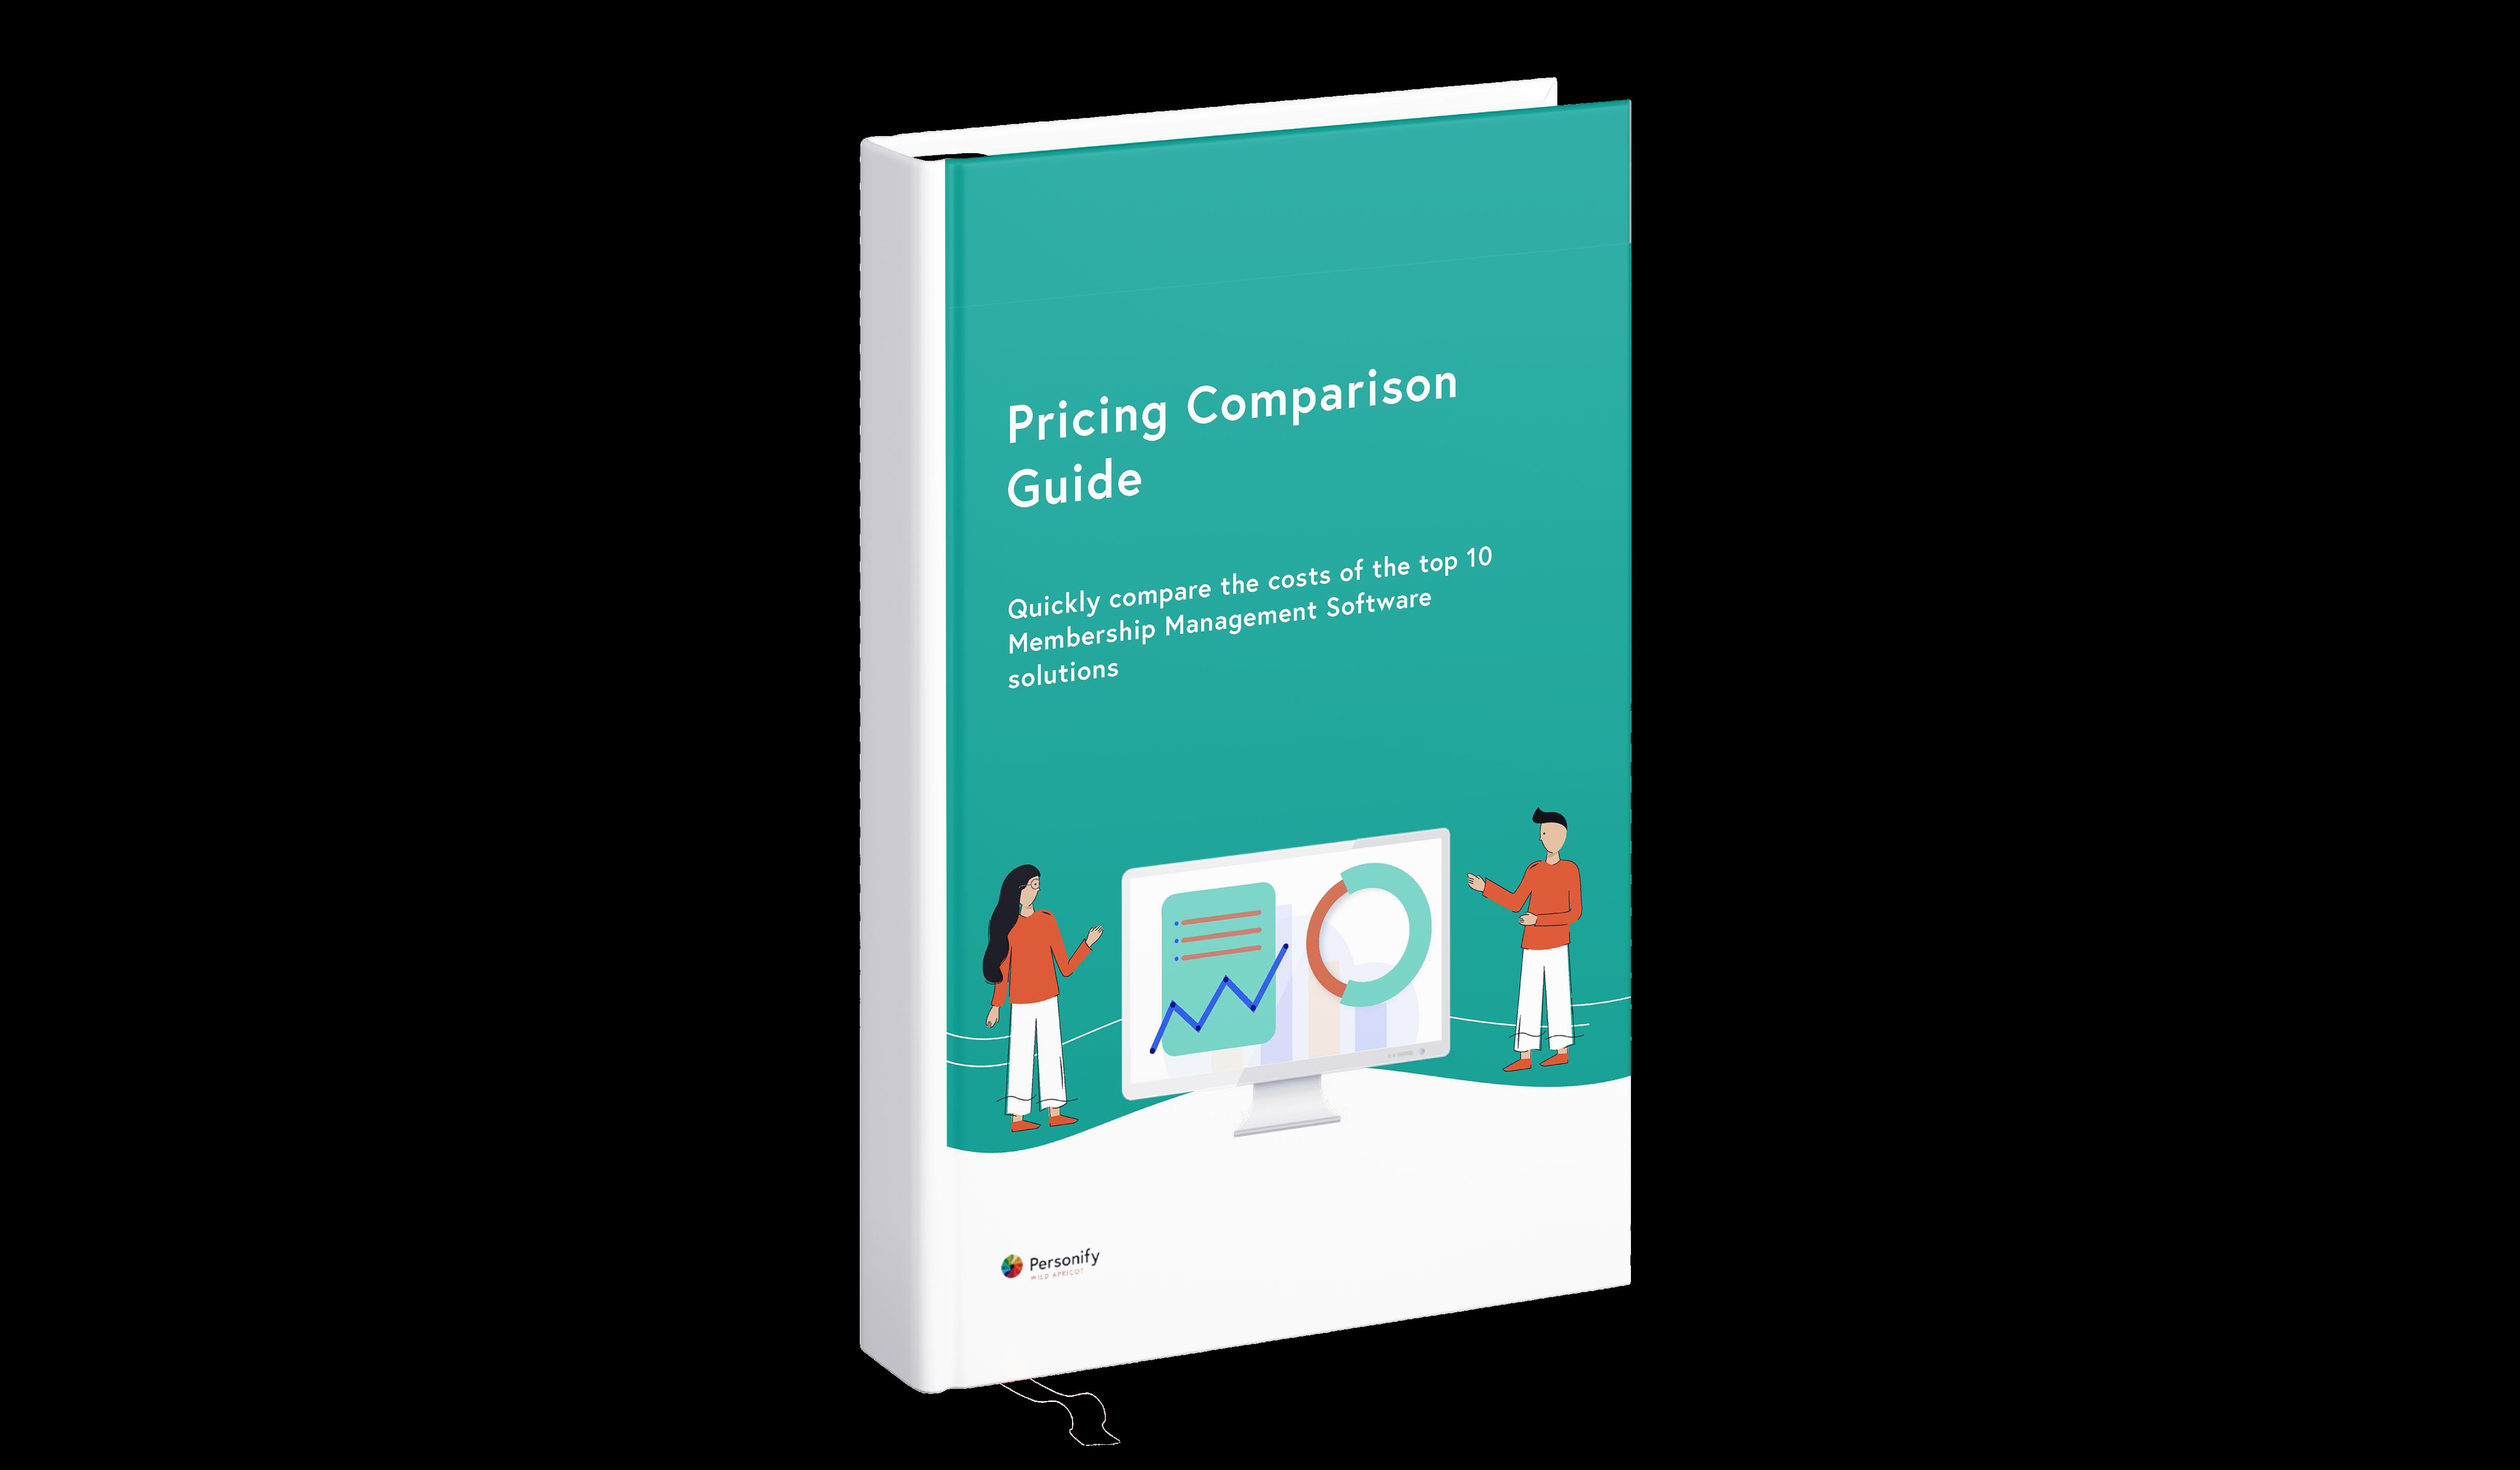 Pricing comparison guide header image